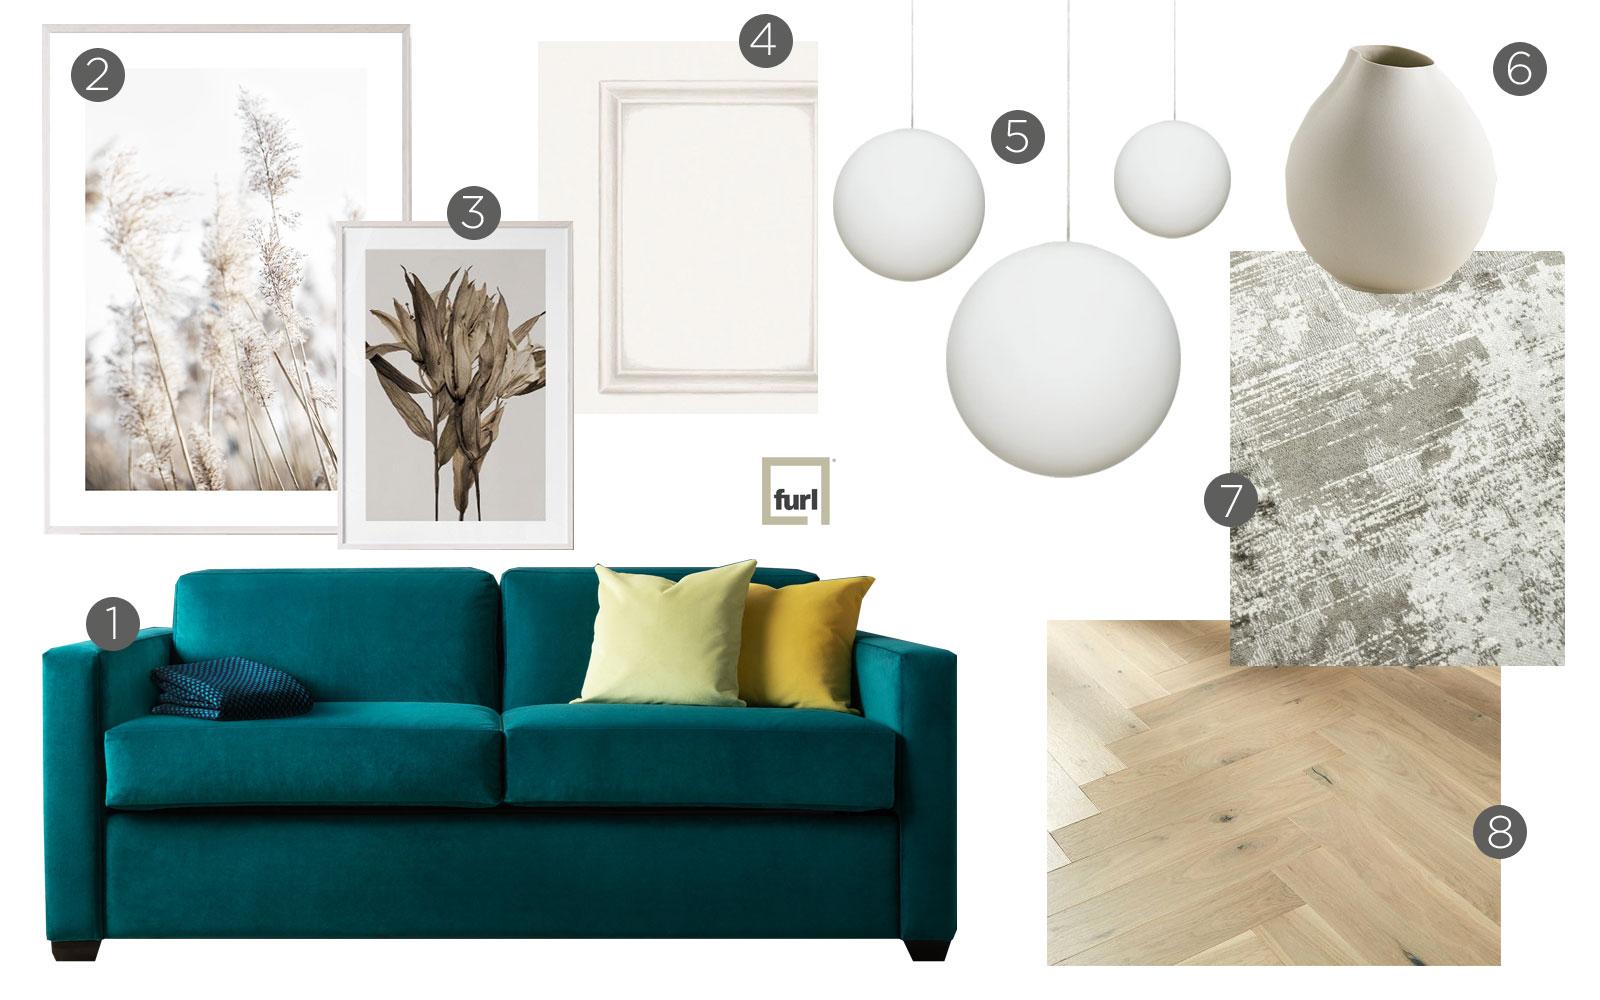 Relaxed Glamour, Relaxed Glamour Interior, Interior Design, Free Interior Design, Interior Design Scheme, Glamorous Interior Design, Glamorous Interior Scheme, Relaxed Interiors, Relaxed Interior Design